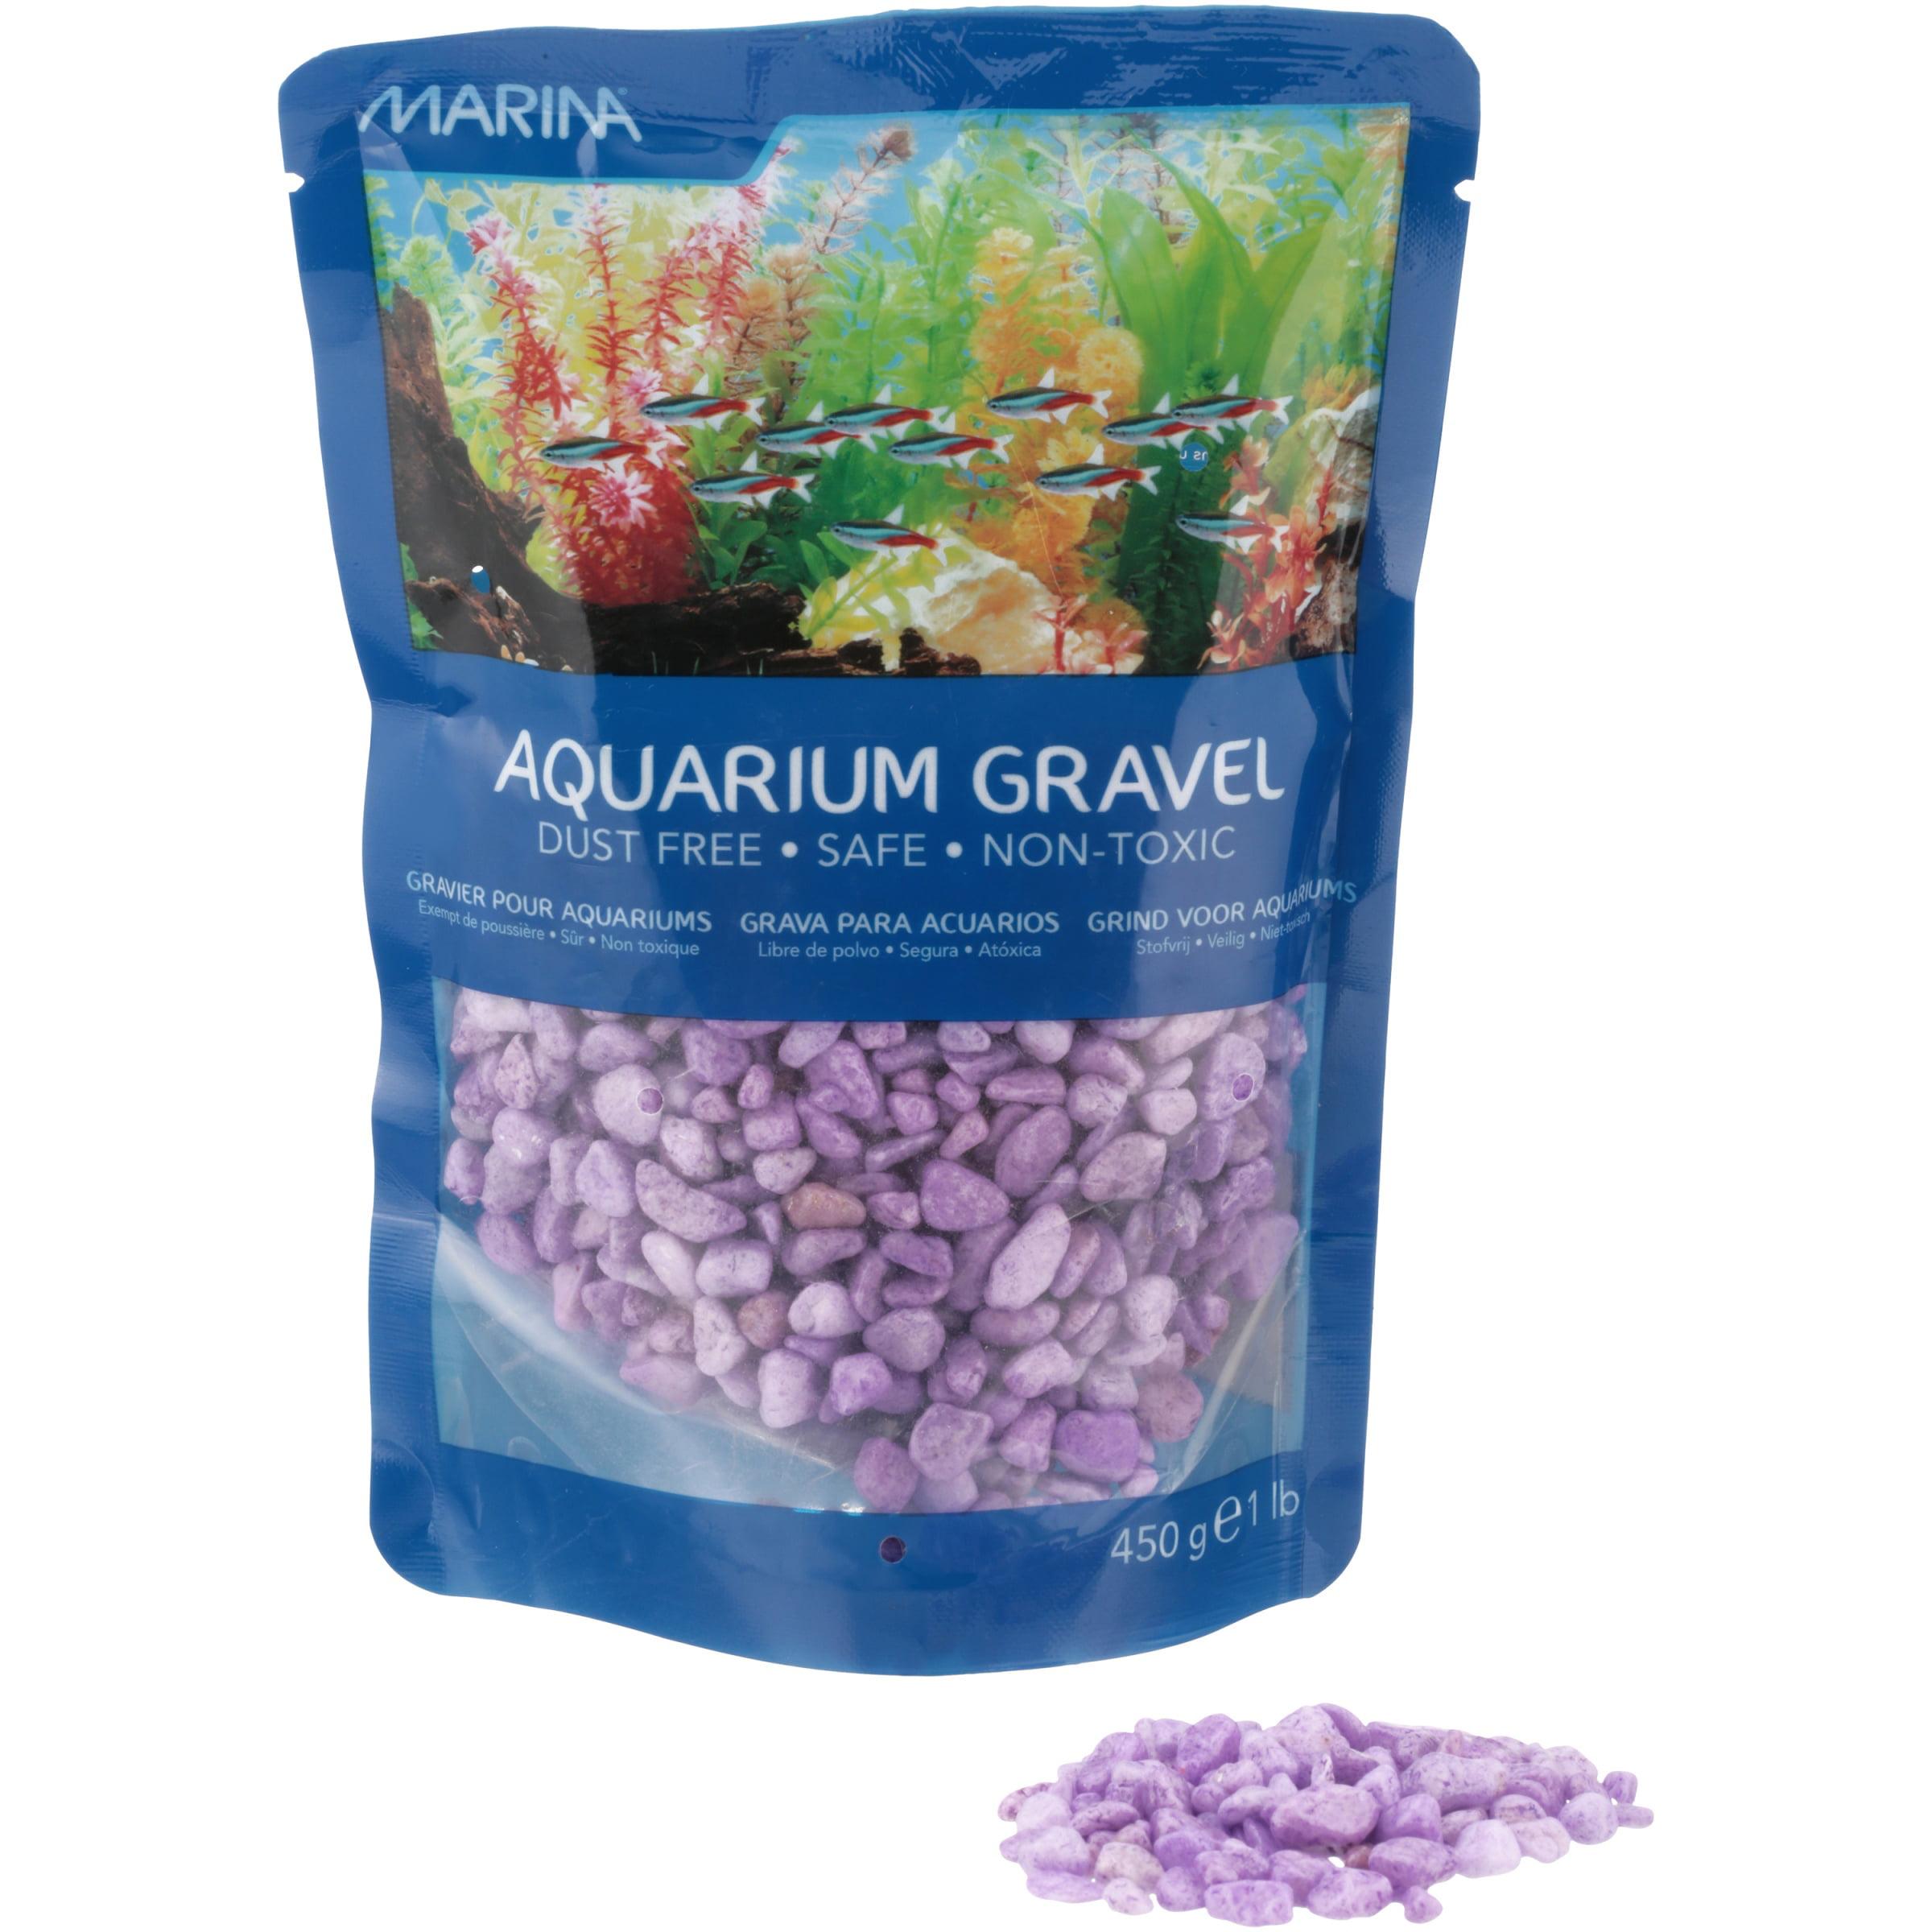 Marina Decorative Aquarium Gravel, Purple, 1-Pound Bag by Hagen